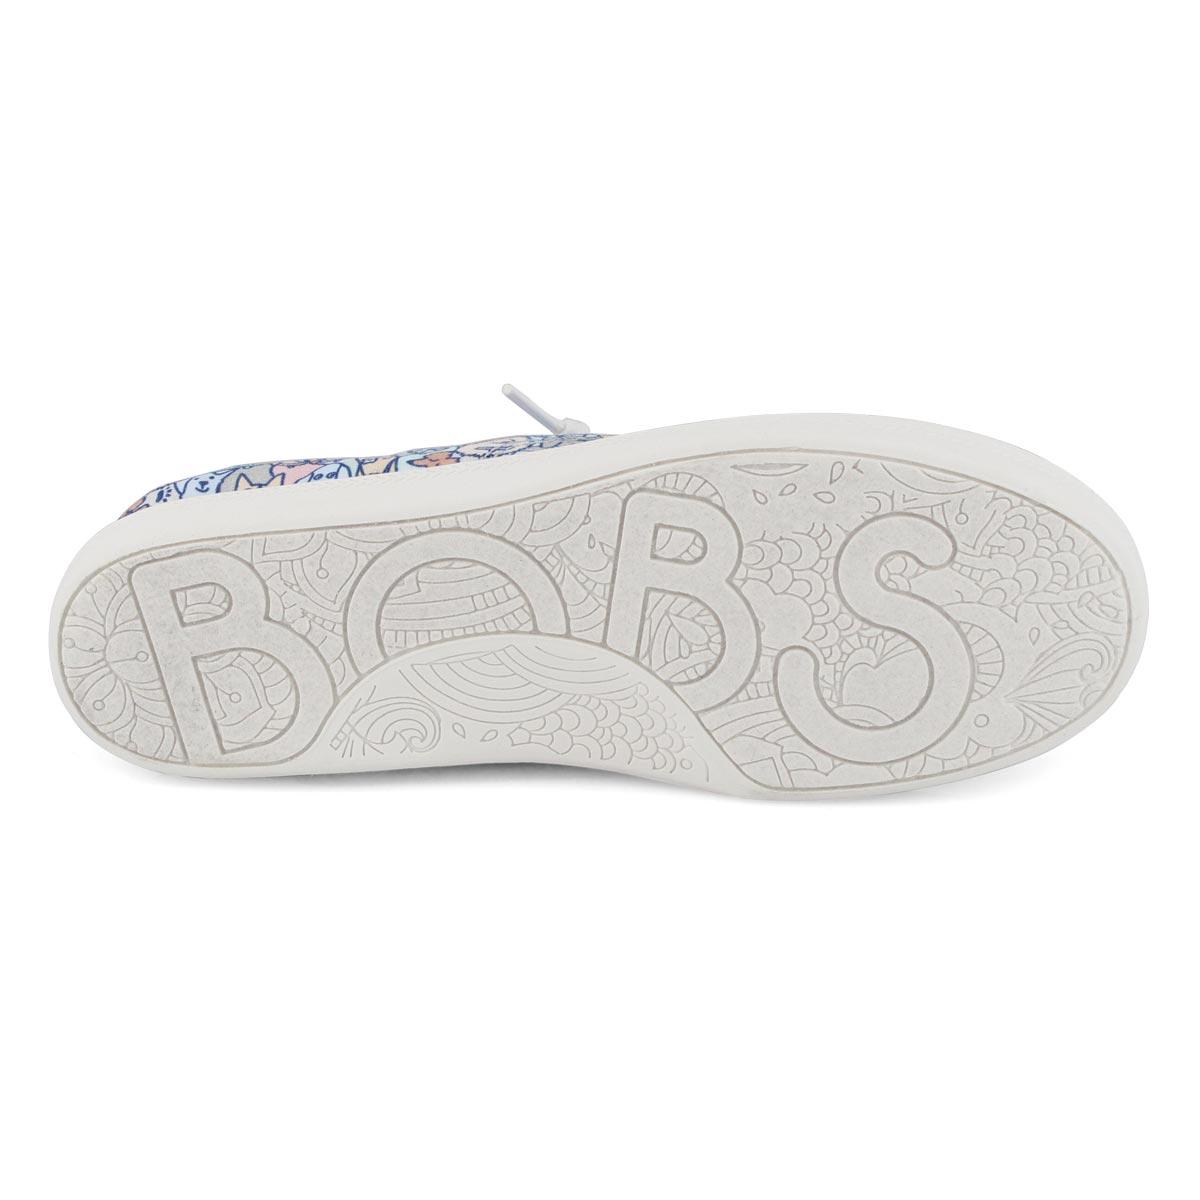 Lds Bobs BeachBingo WoofPack blu/pnk snk